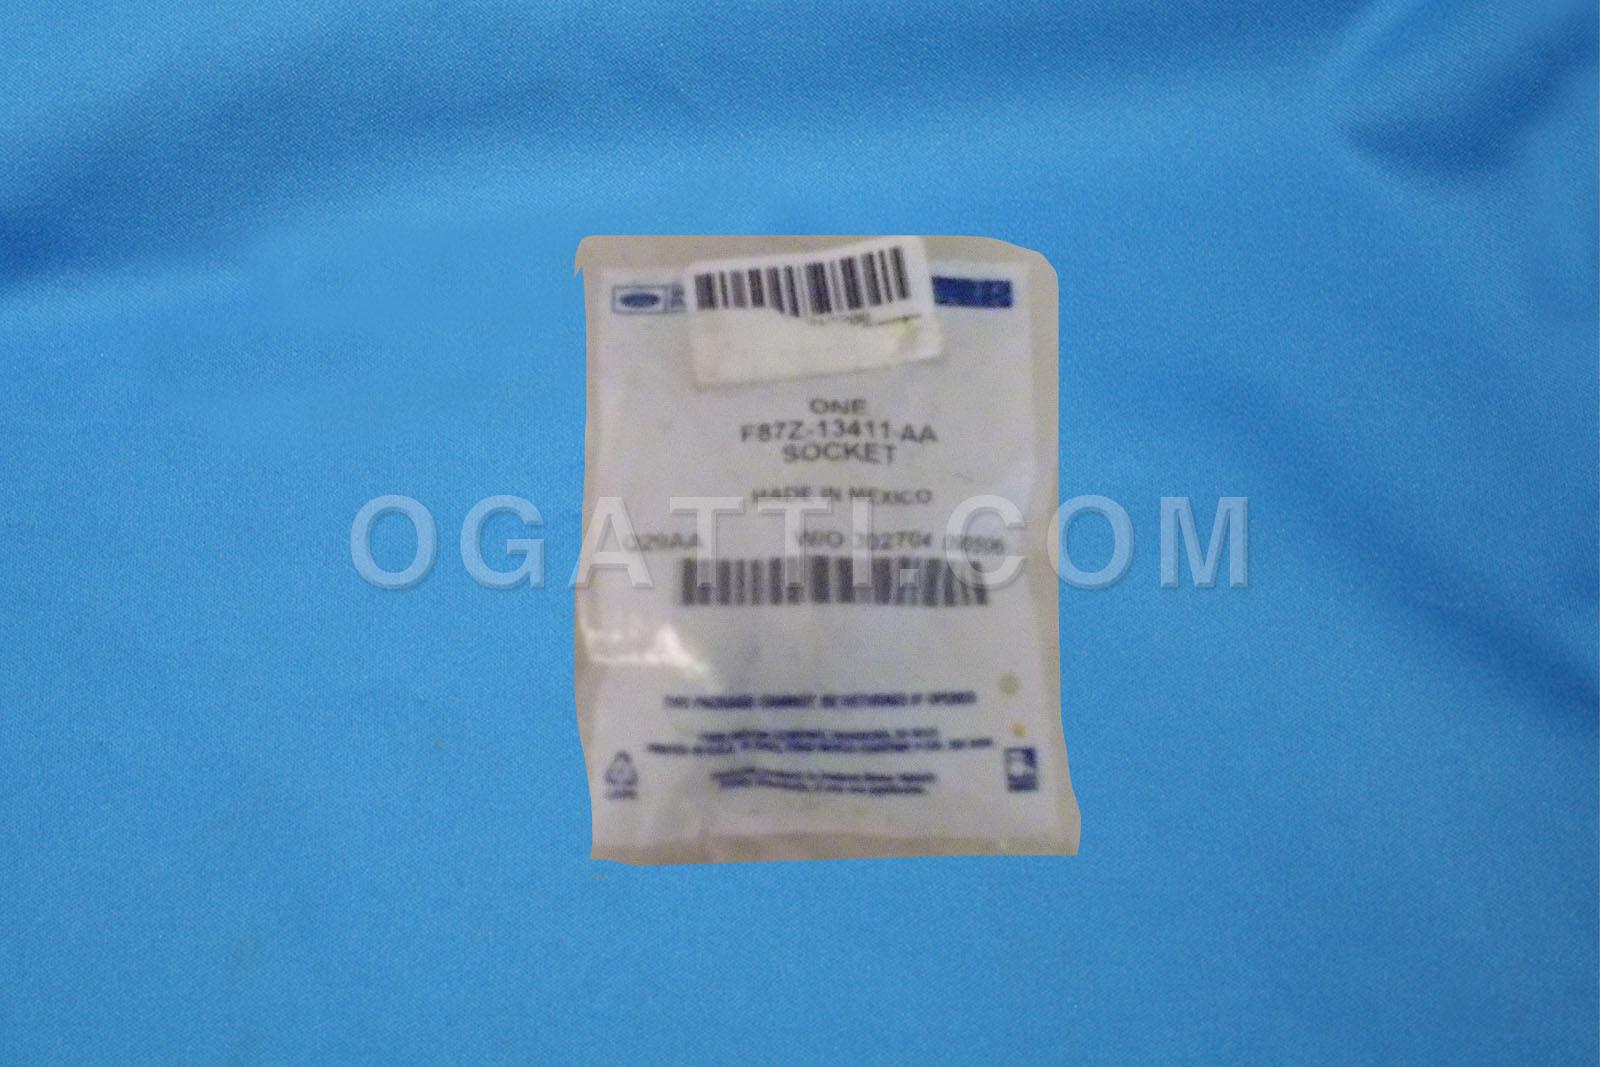 Brand New OEM SOCKET ASY F87Z-13411-AA |13411|